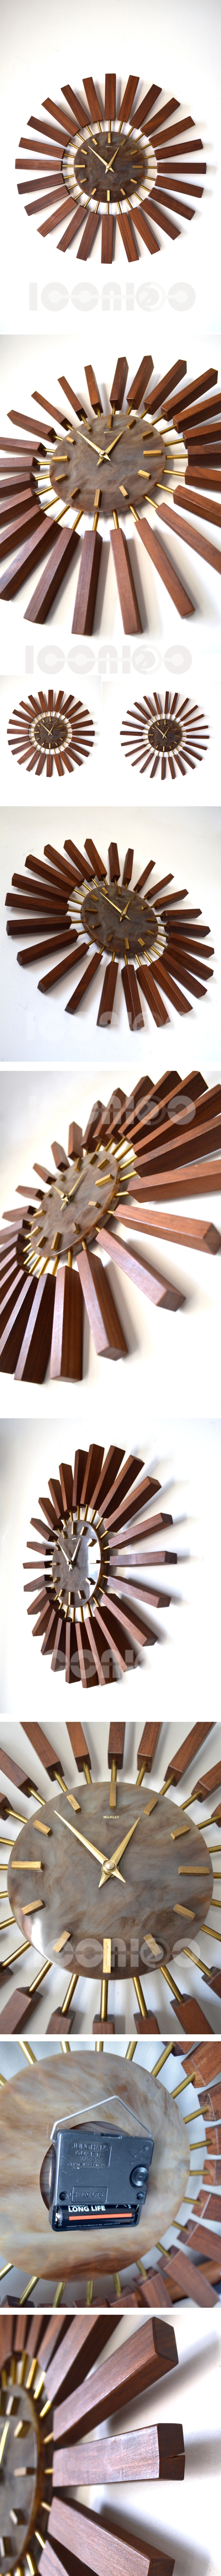 manley rosewood sunburst wall clock